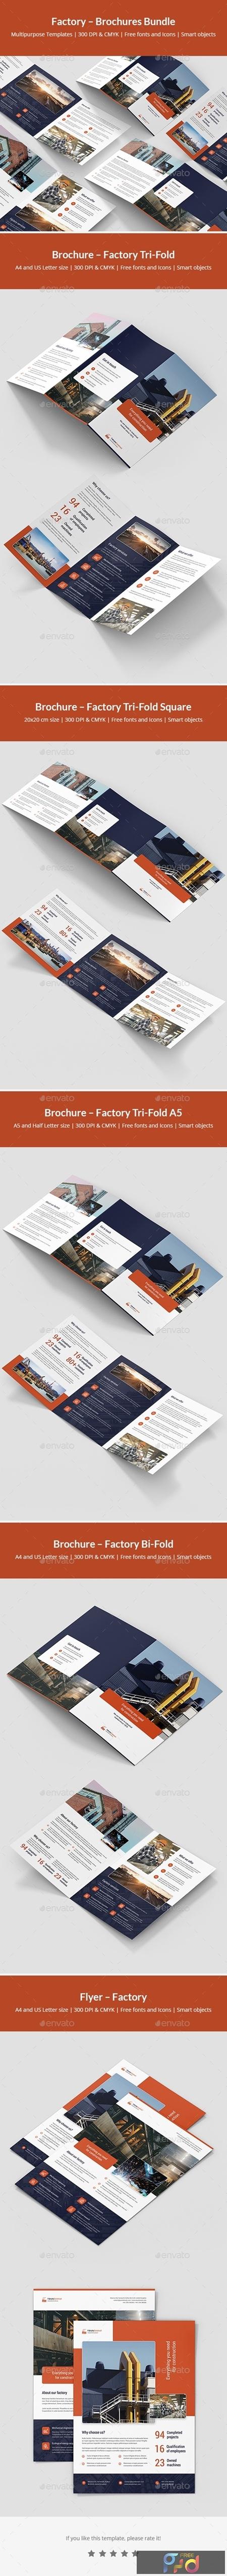 Factory – Brochures Bundle Print Templates 5 in 1 24716470 1